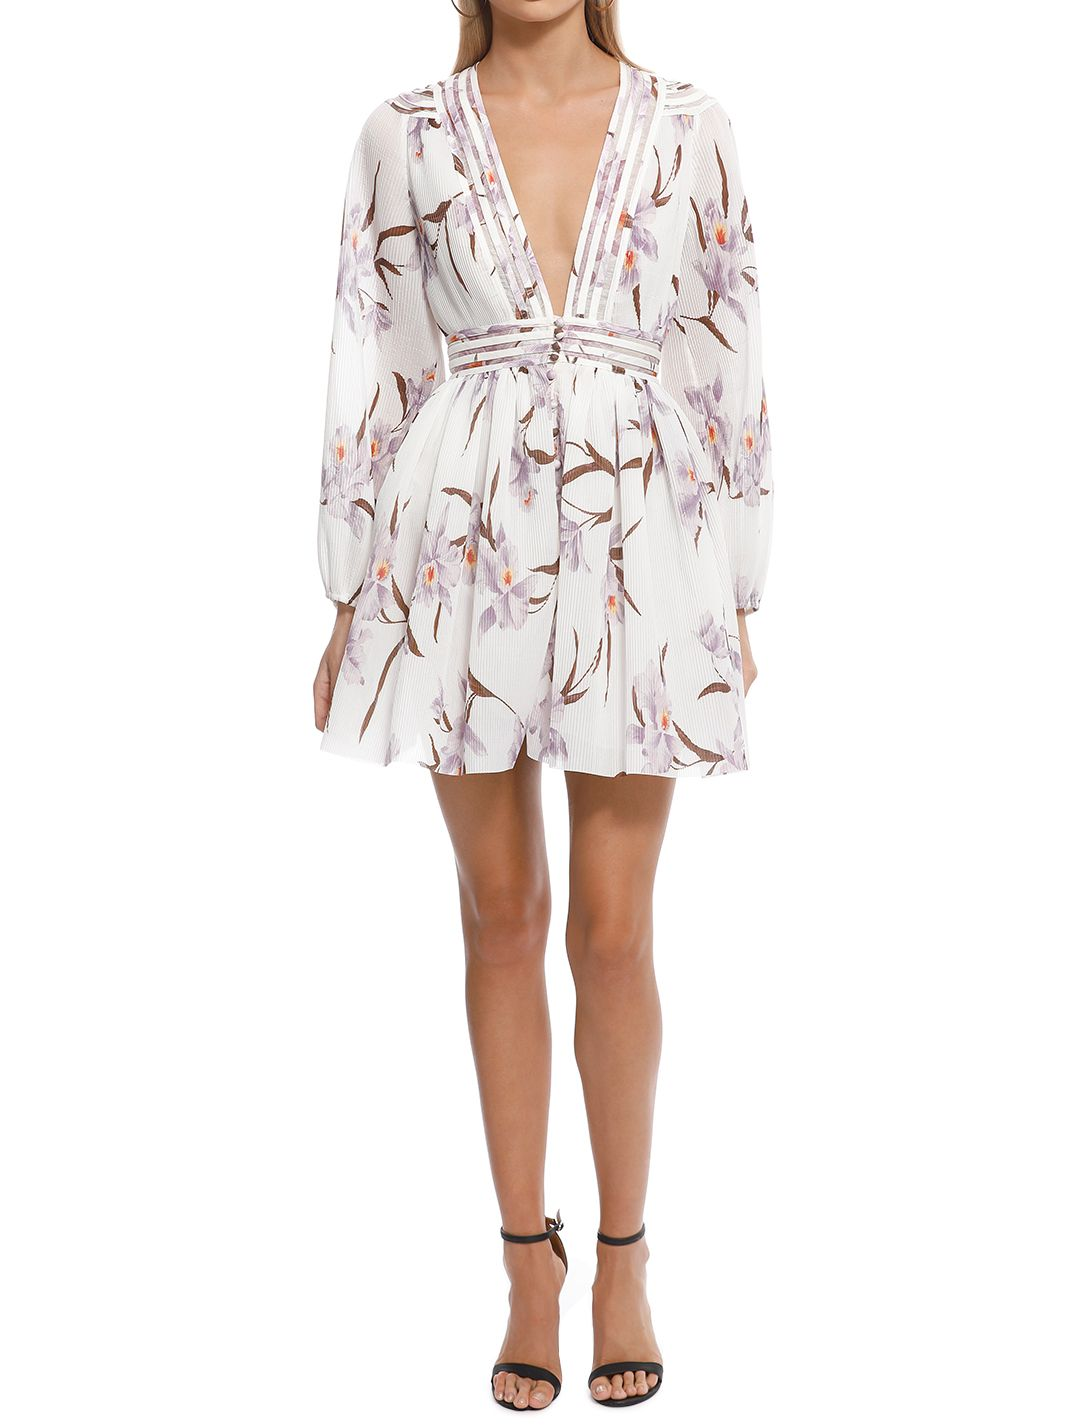 Zimmermann - Corsage Plisse Mini Dress - Ivory Print - Front